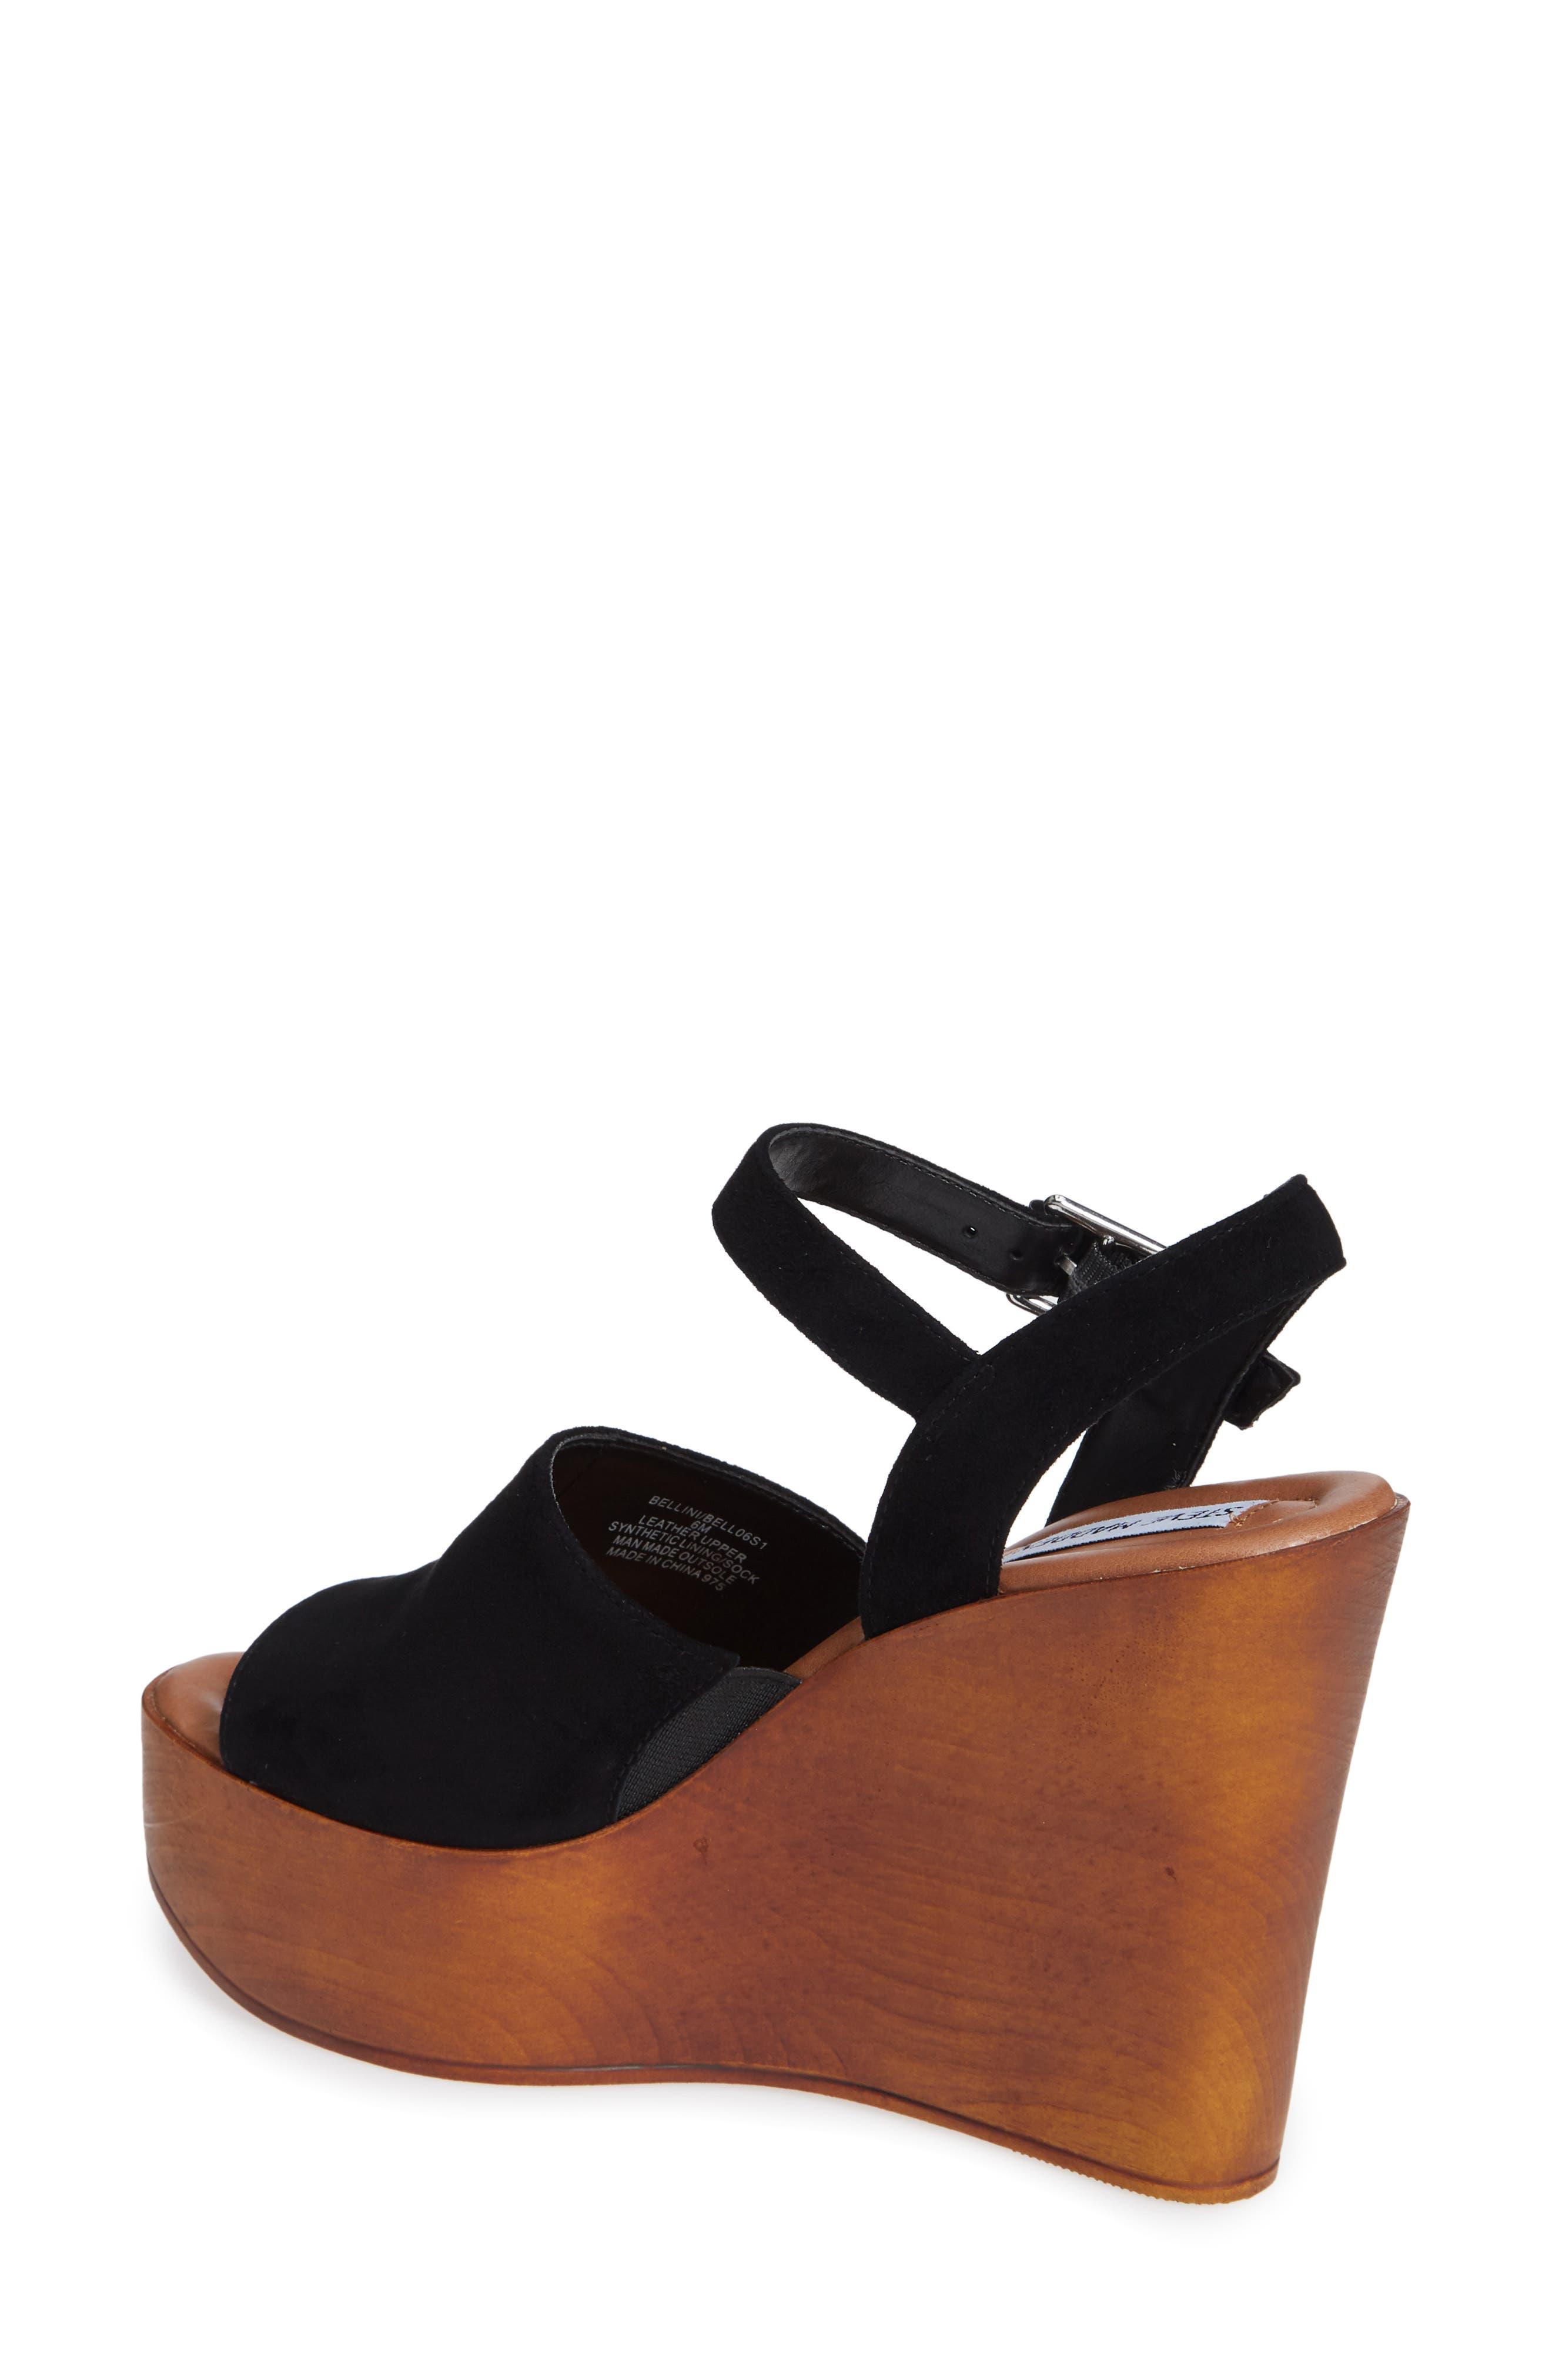 Bellini Wedge Sandal,                             Alternate thumbnail 2, color,                             BLACK SUEDE